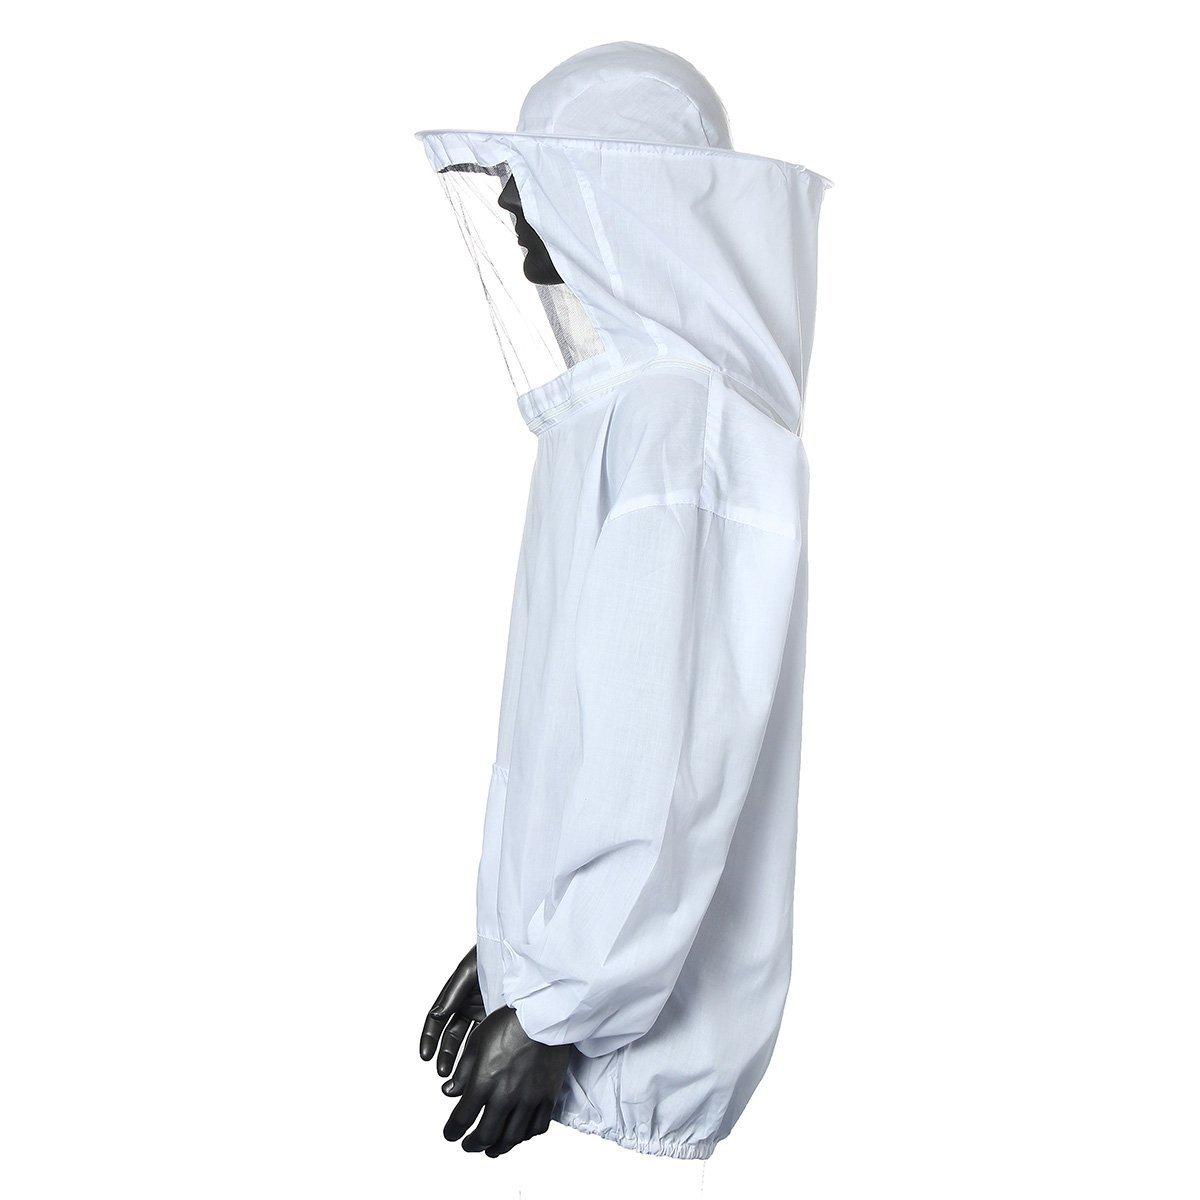 Binnan Traje de Apicultor Profesional para Apicultura,Blanco